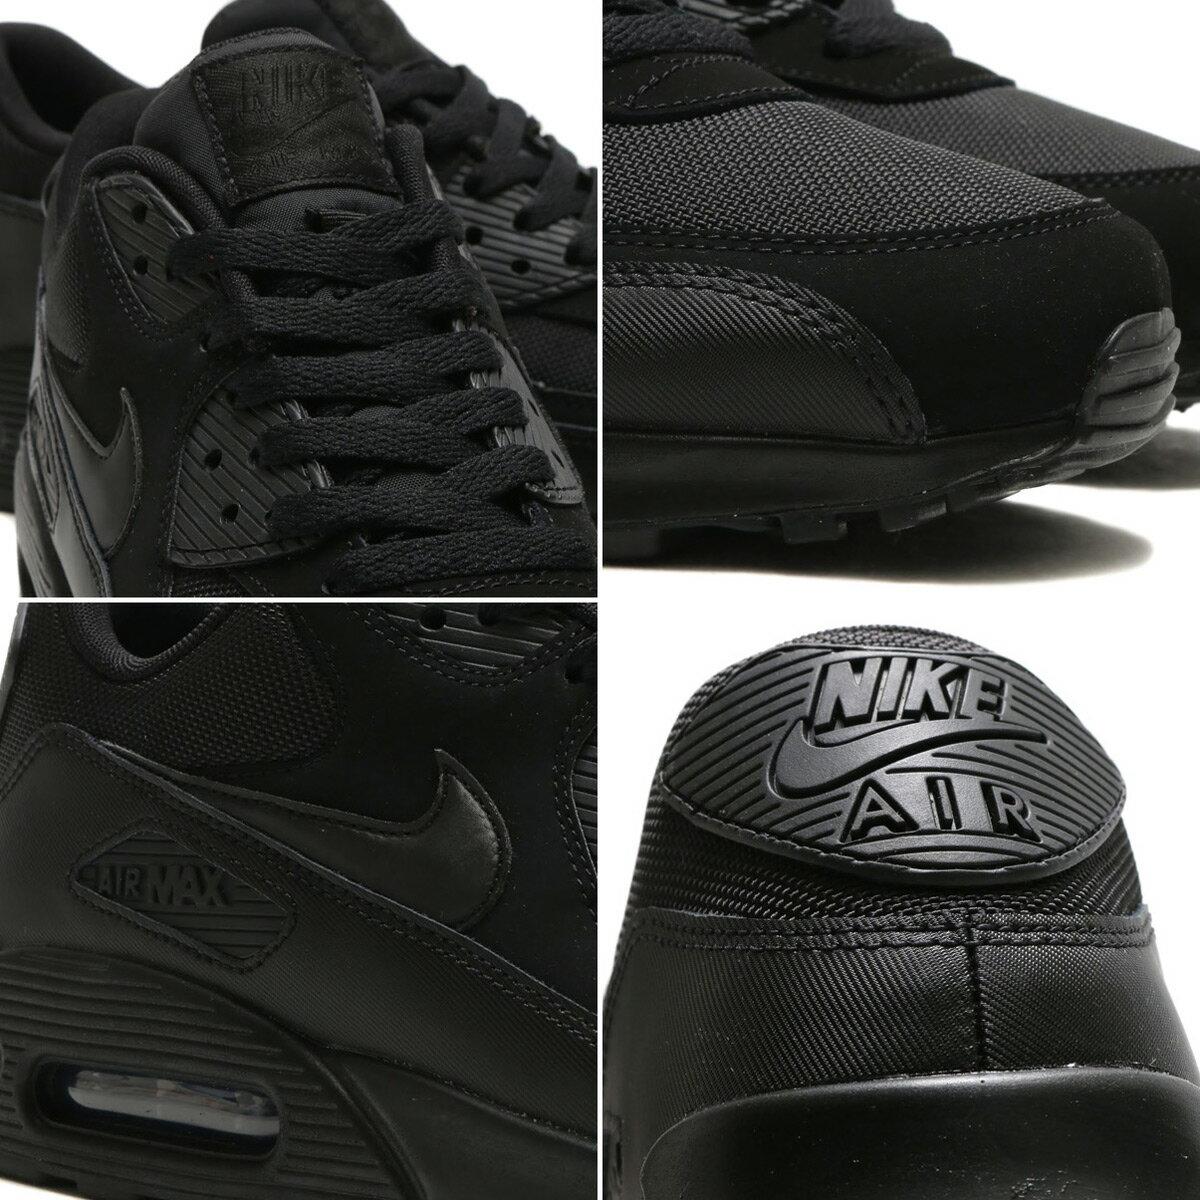 NIKE AIR MAX 90 ESSENTIAL(ナイキ エア マックス 90 エッセンシャル)BLACK/BLACK-BLACK-BLACK-BLACK-BLACK17SP-S